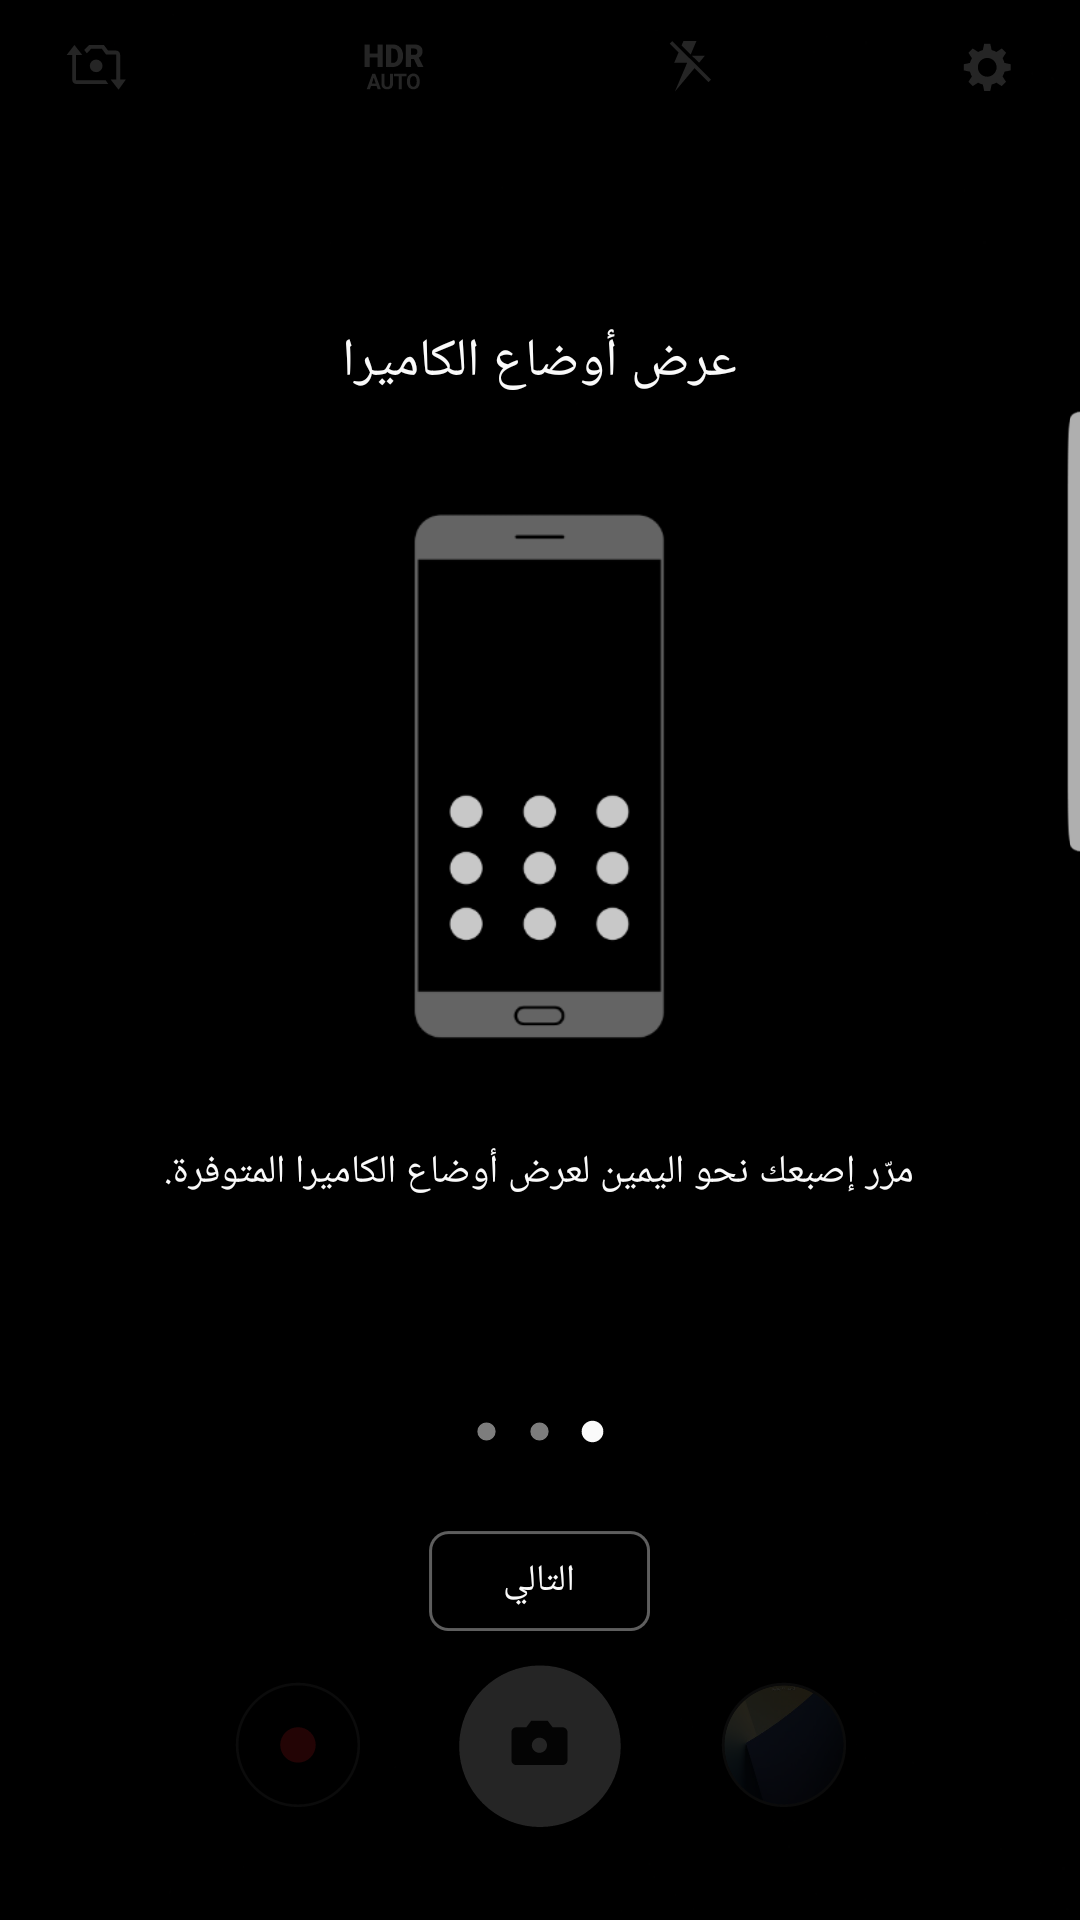 b16306051633594243e786aa8daa66ec